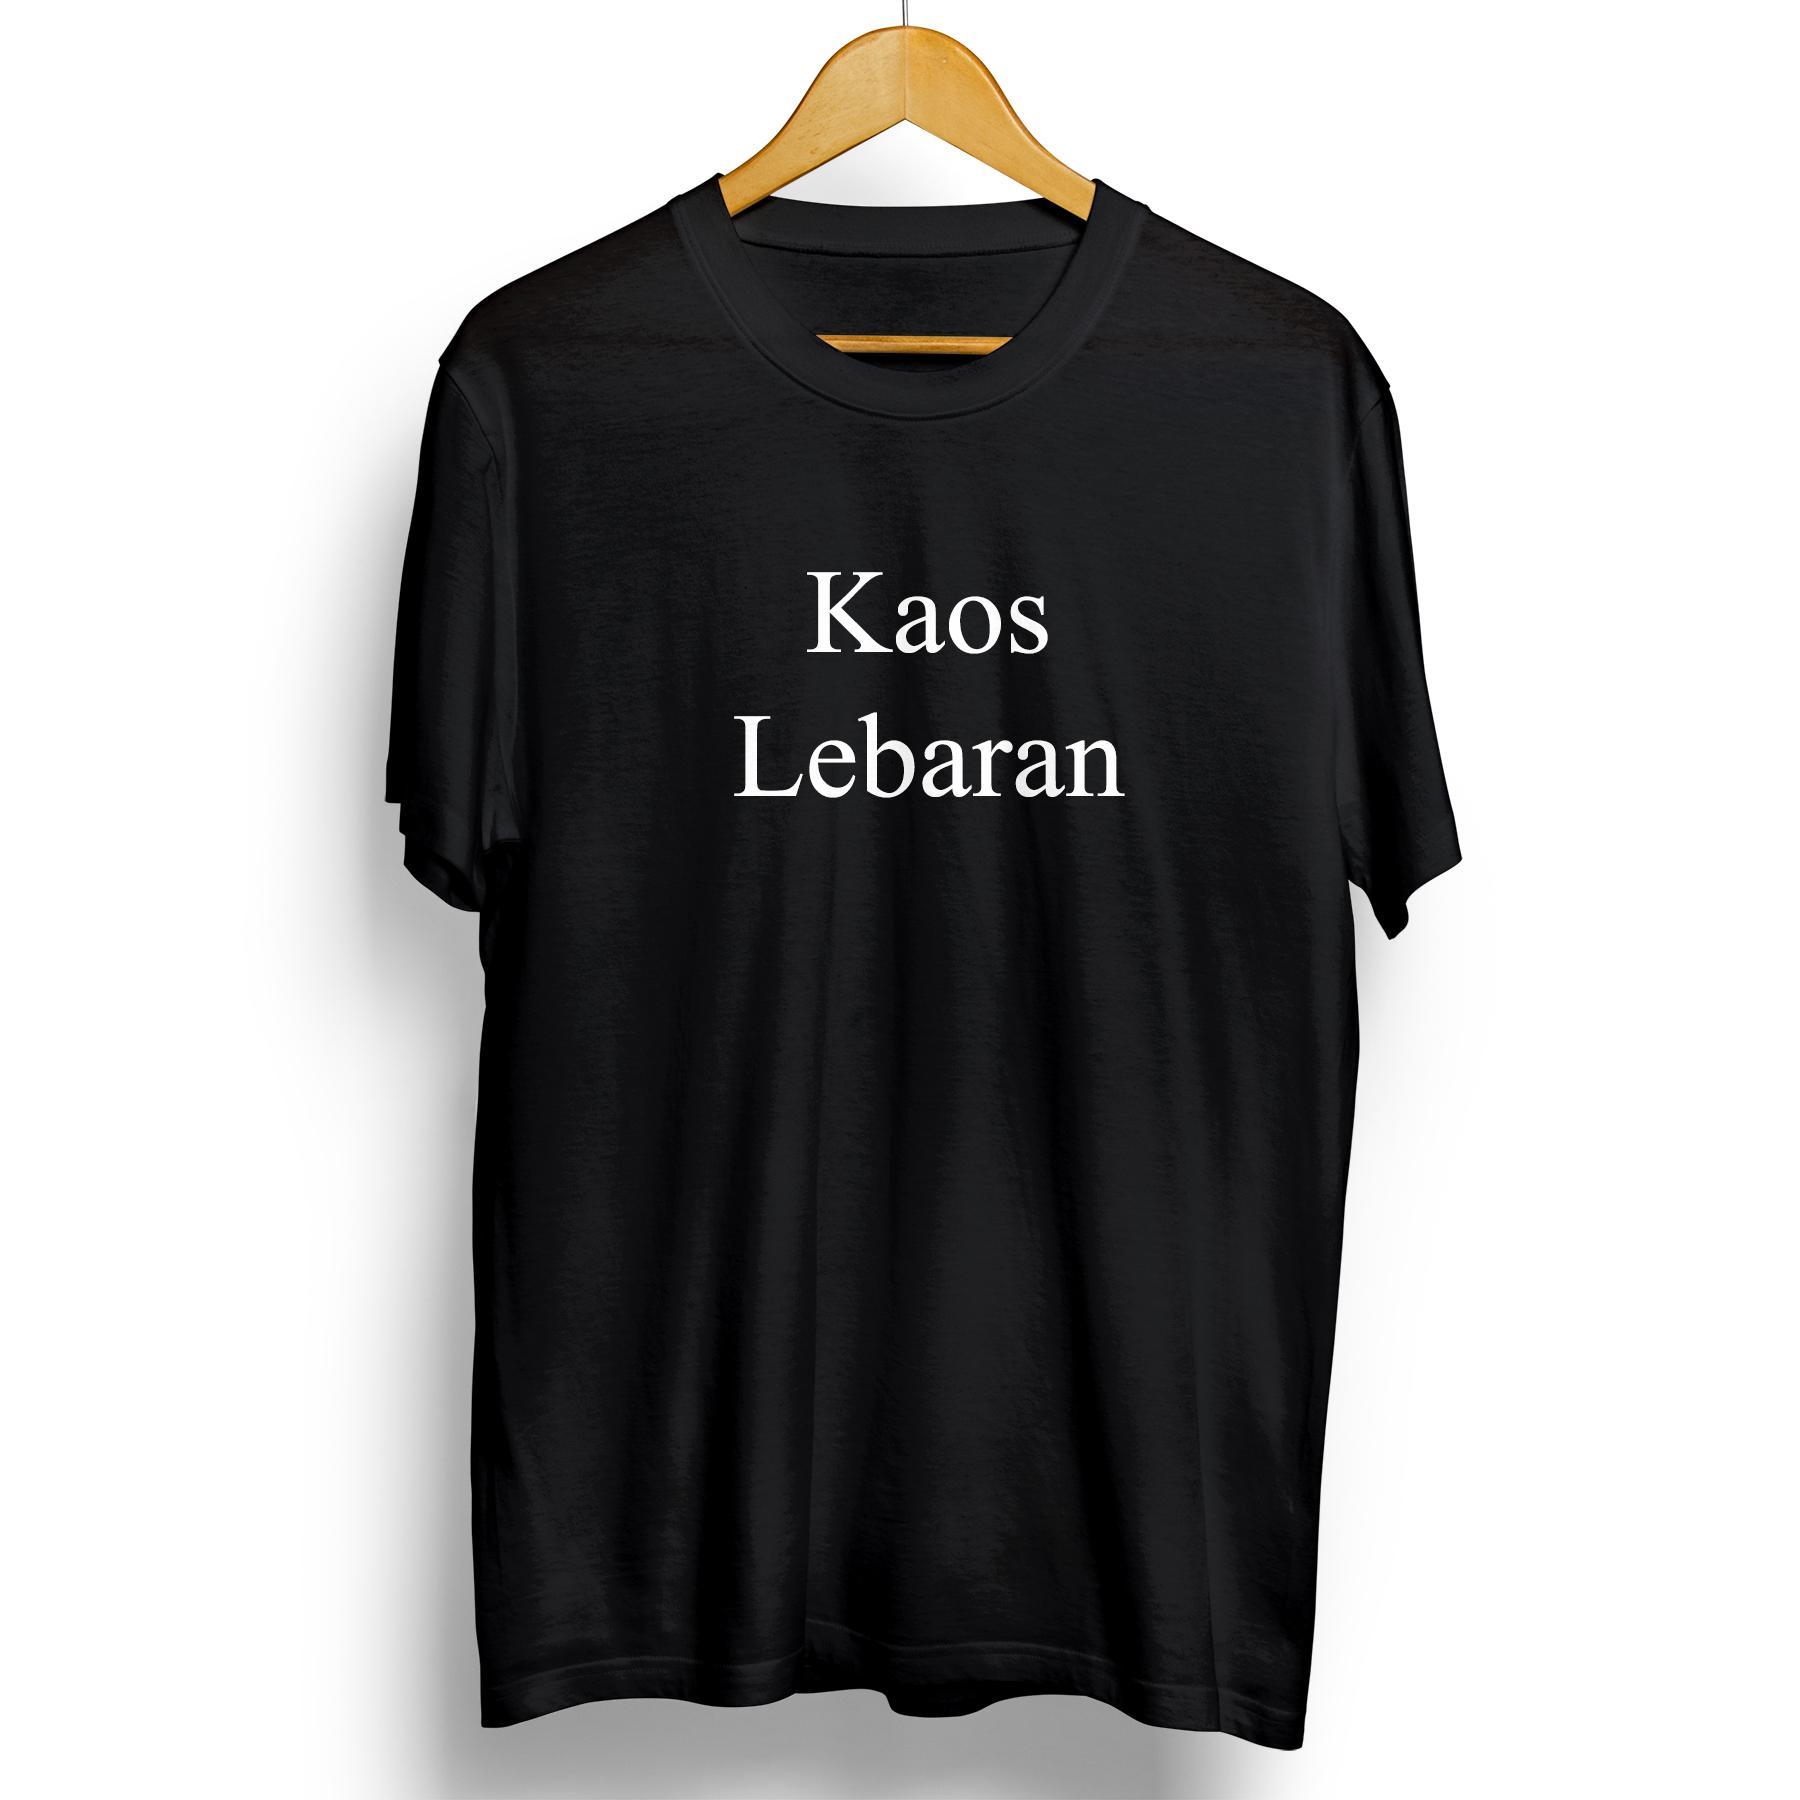 Kaos Distro Pria / Wanita Dakwah Islam Muslim - Baju Lebaran